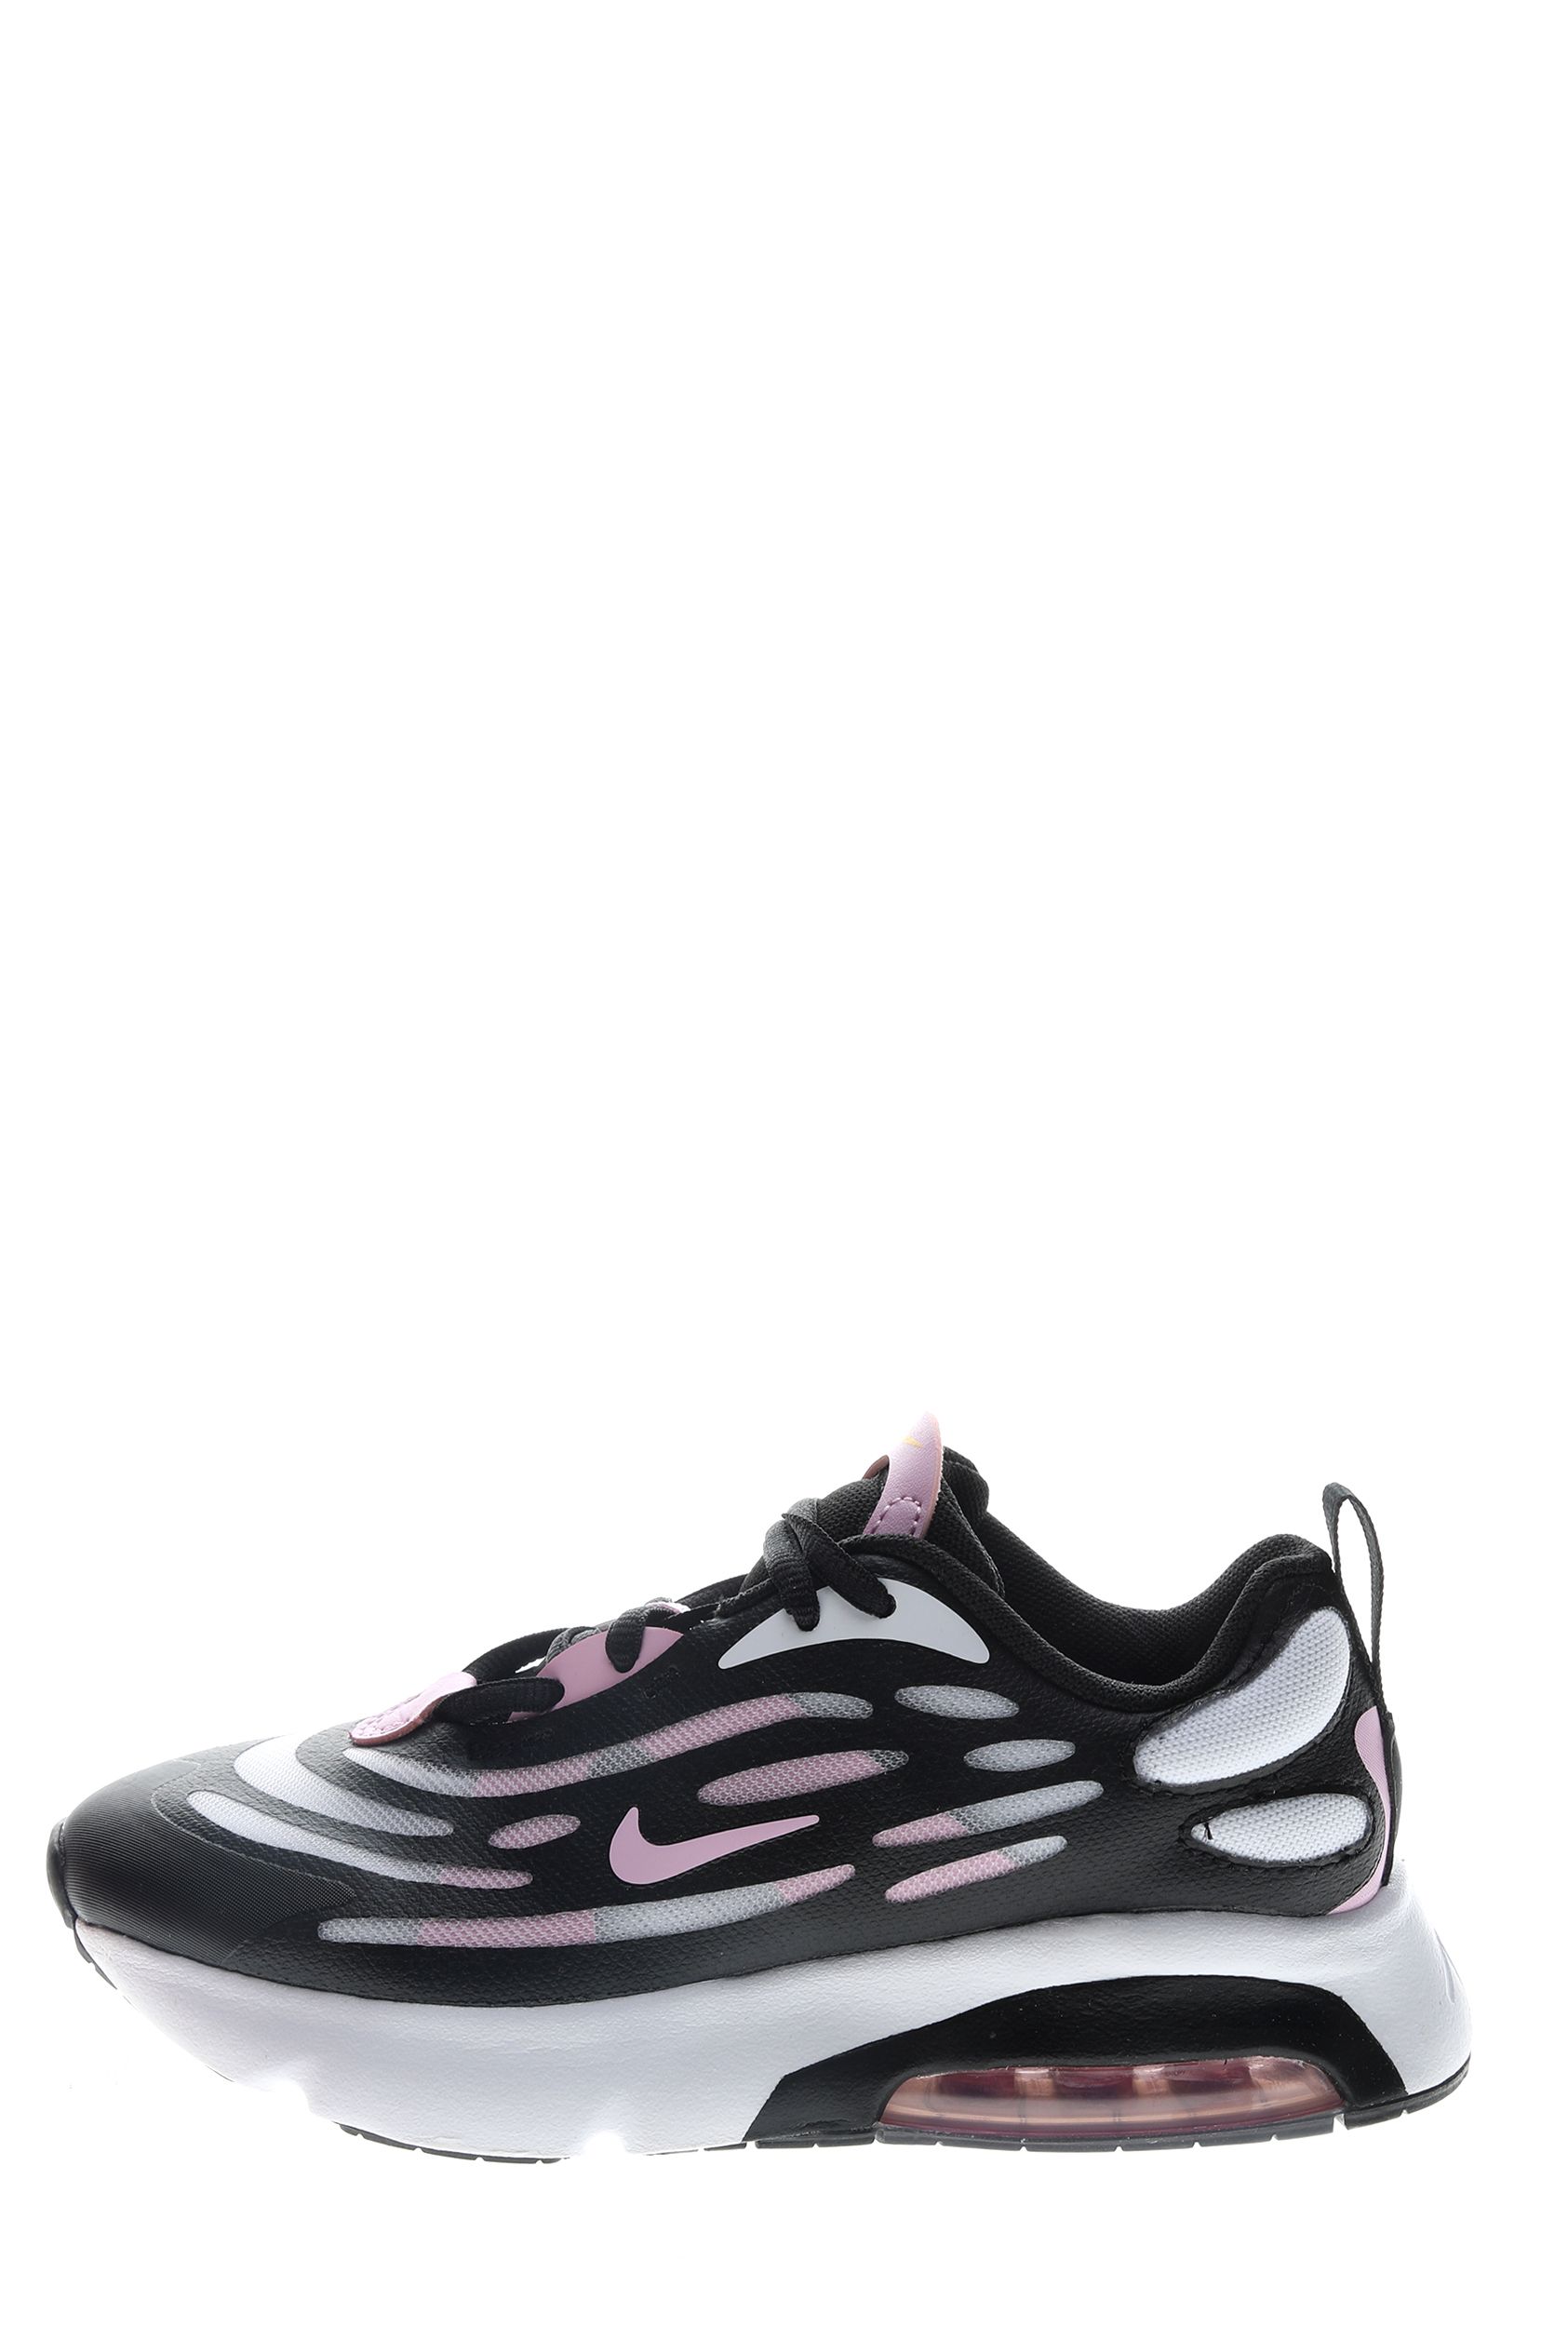 NIKE – Παιδικά αθλητικά παπούτσια NIKE AIR MAX EXOSENSE (PS) μαύρα λευκά